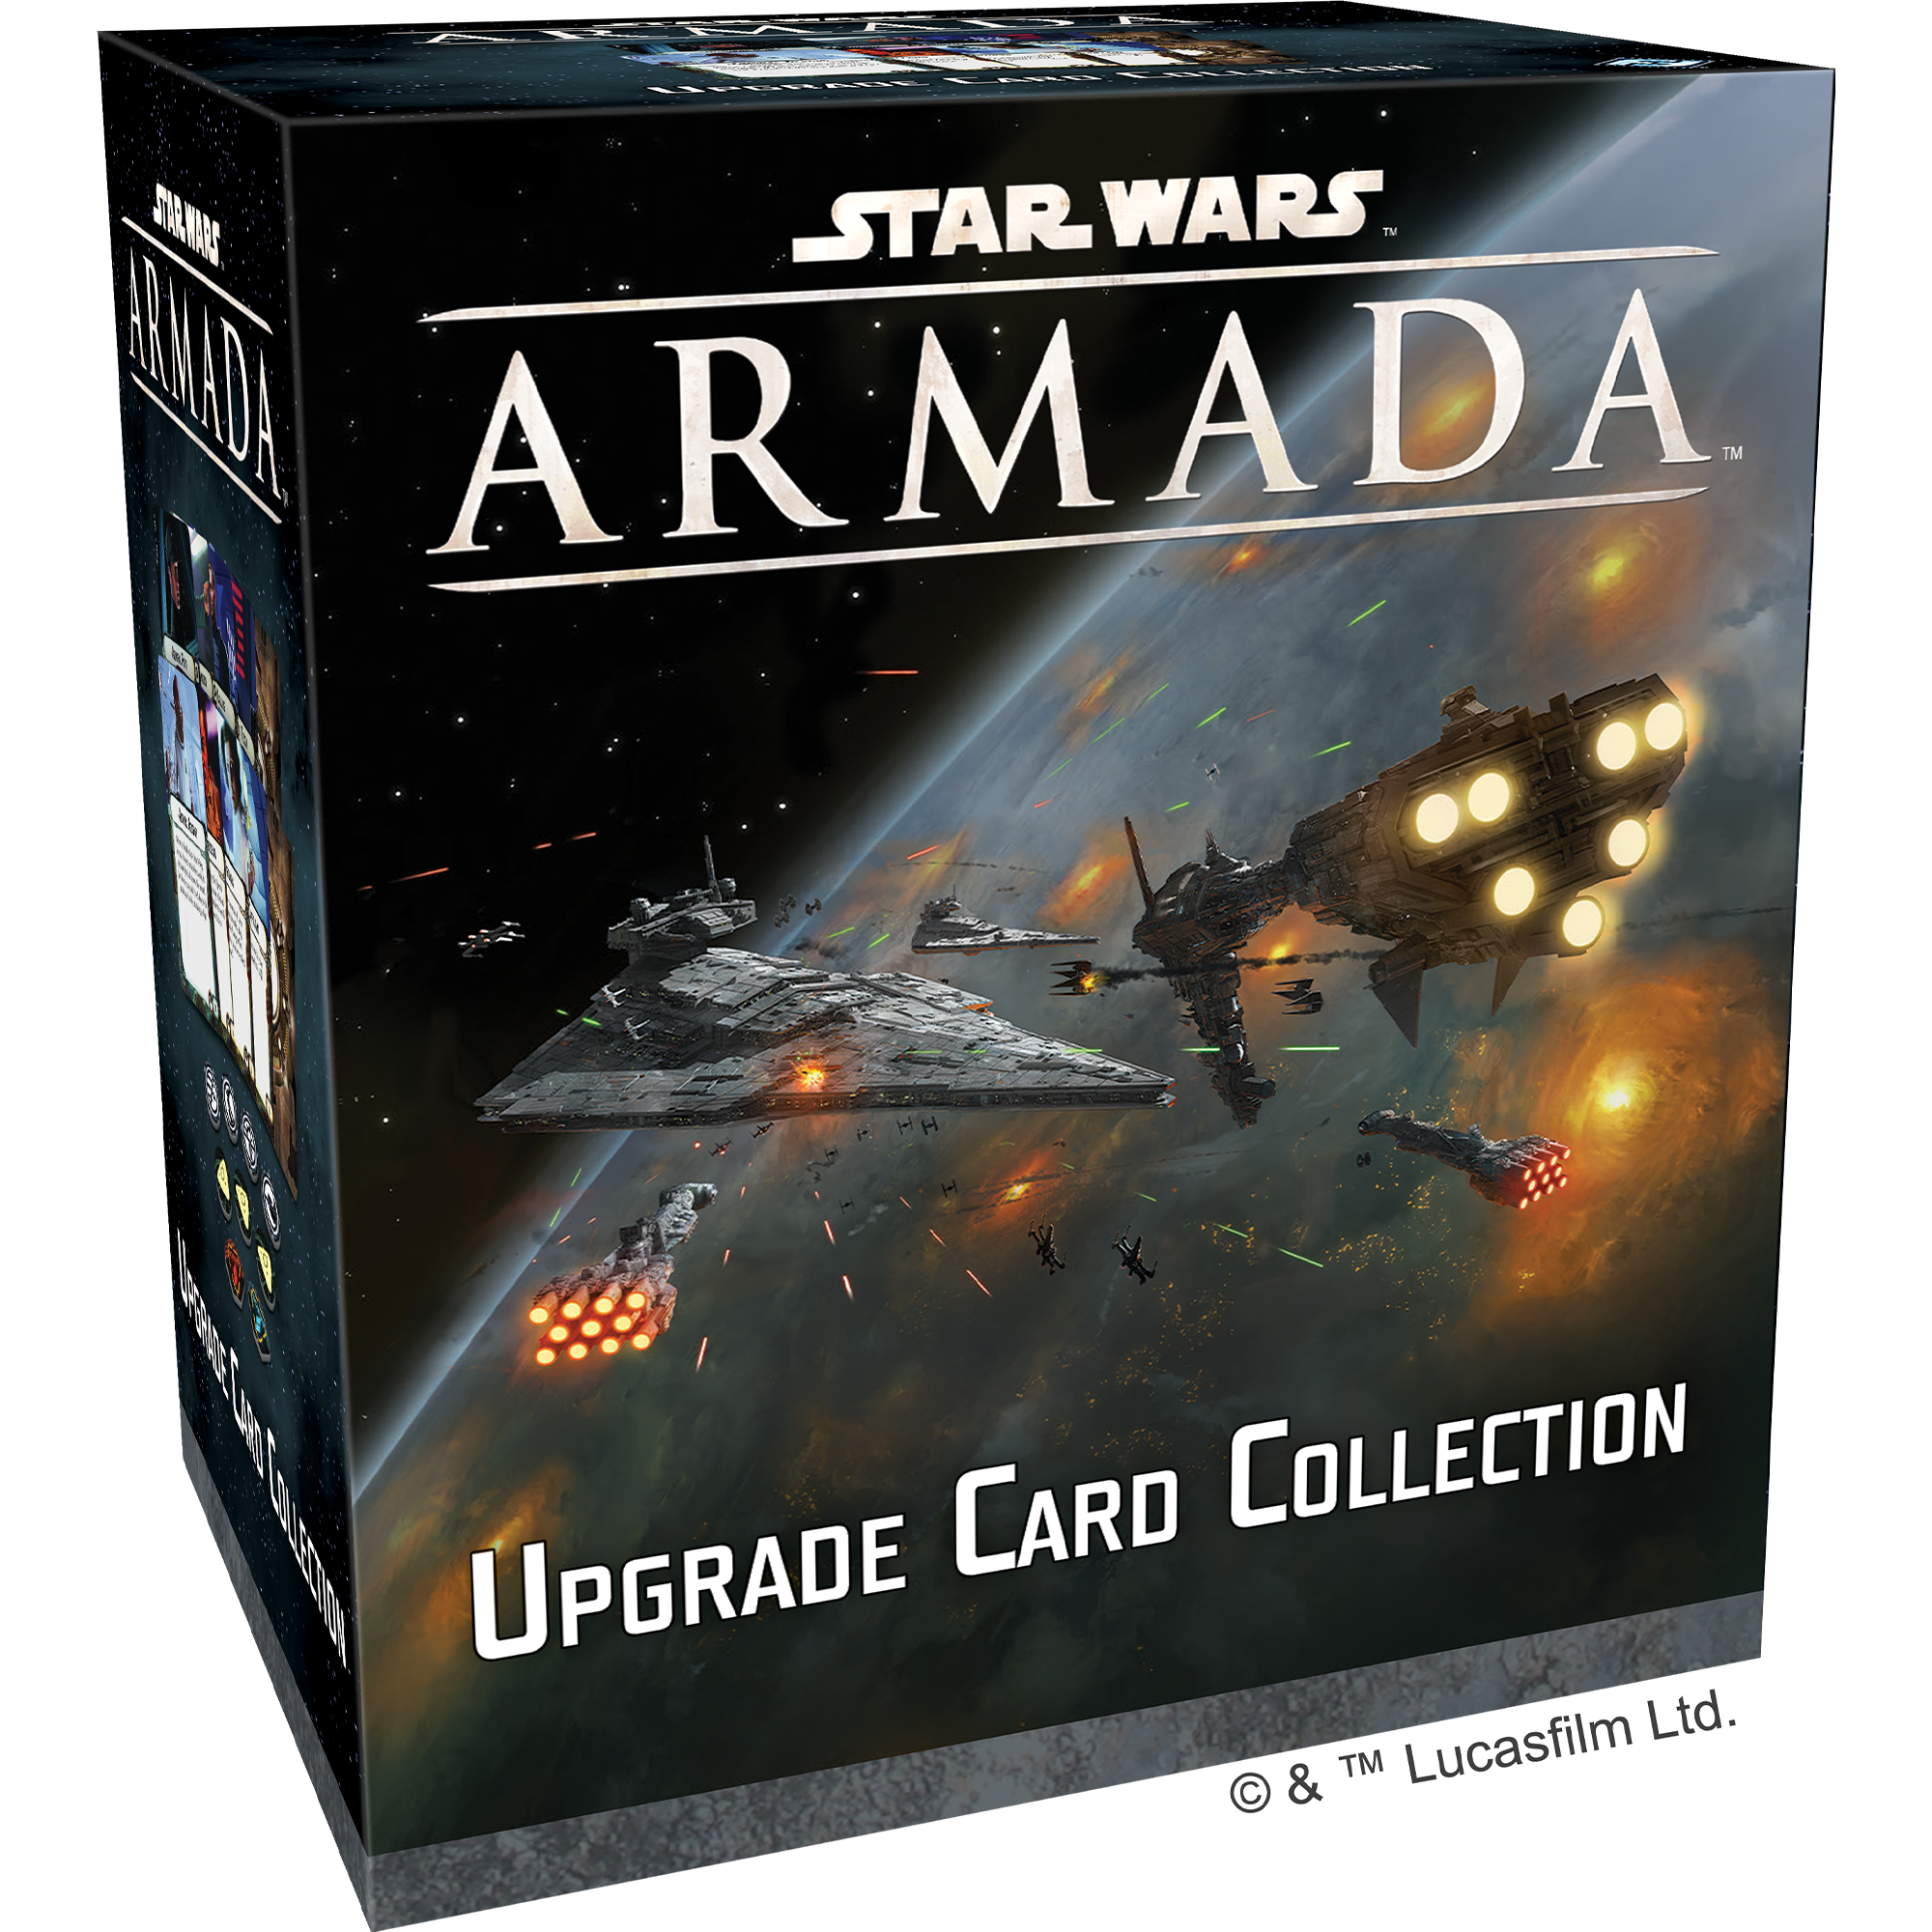 [Armada] Wave IX - Clone Wars Swm38-box-left